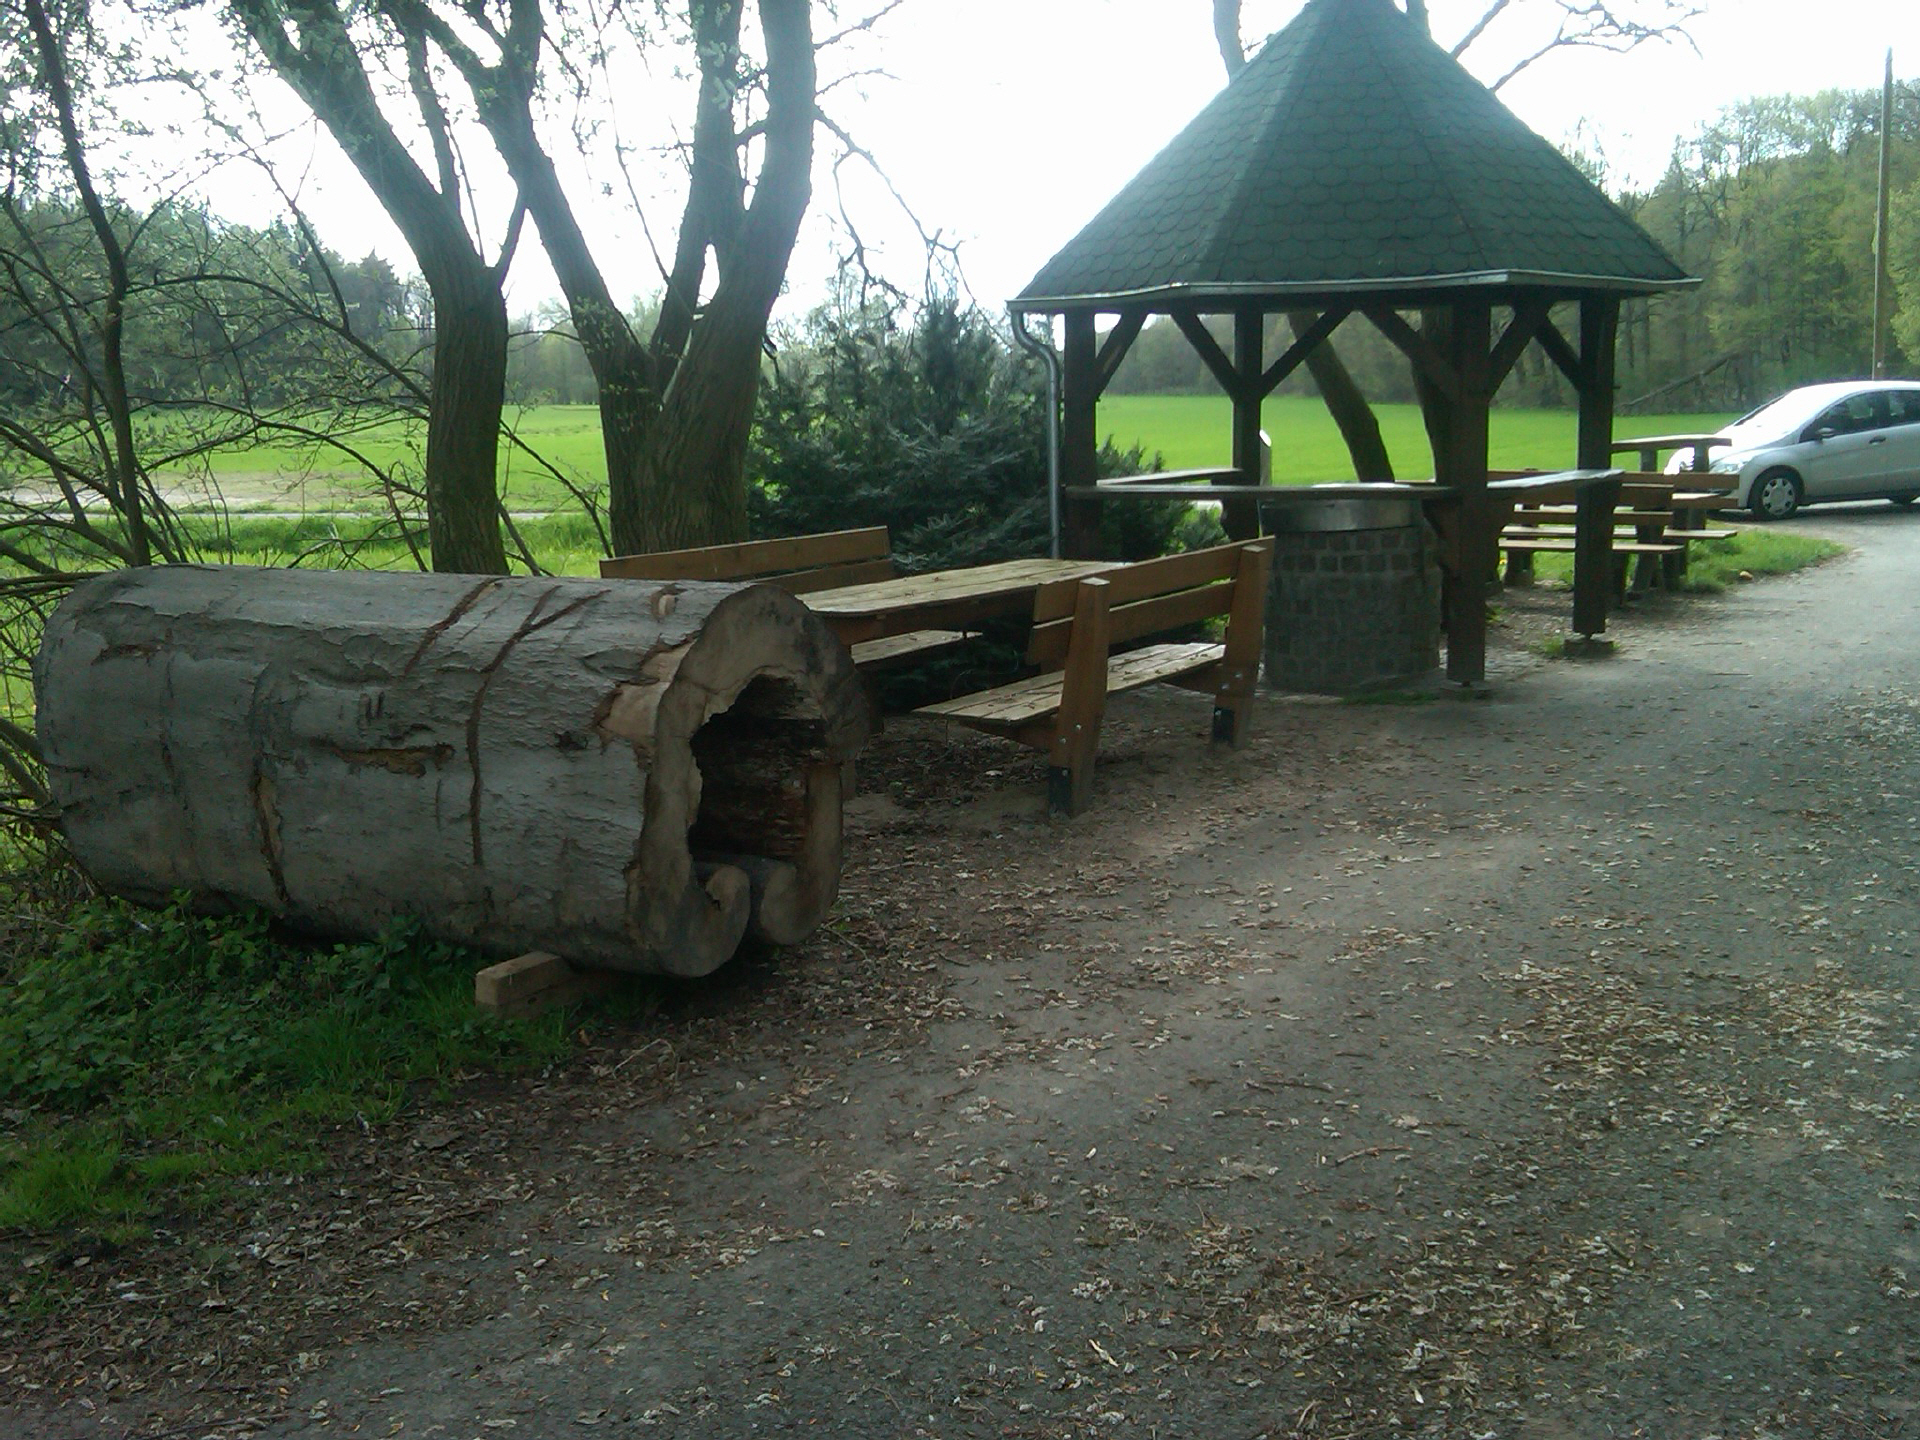 Krinkhuette - Grillplatz